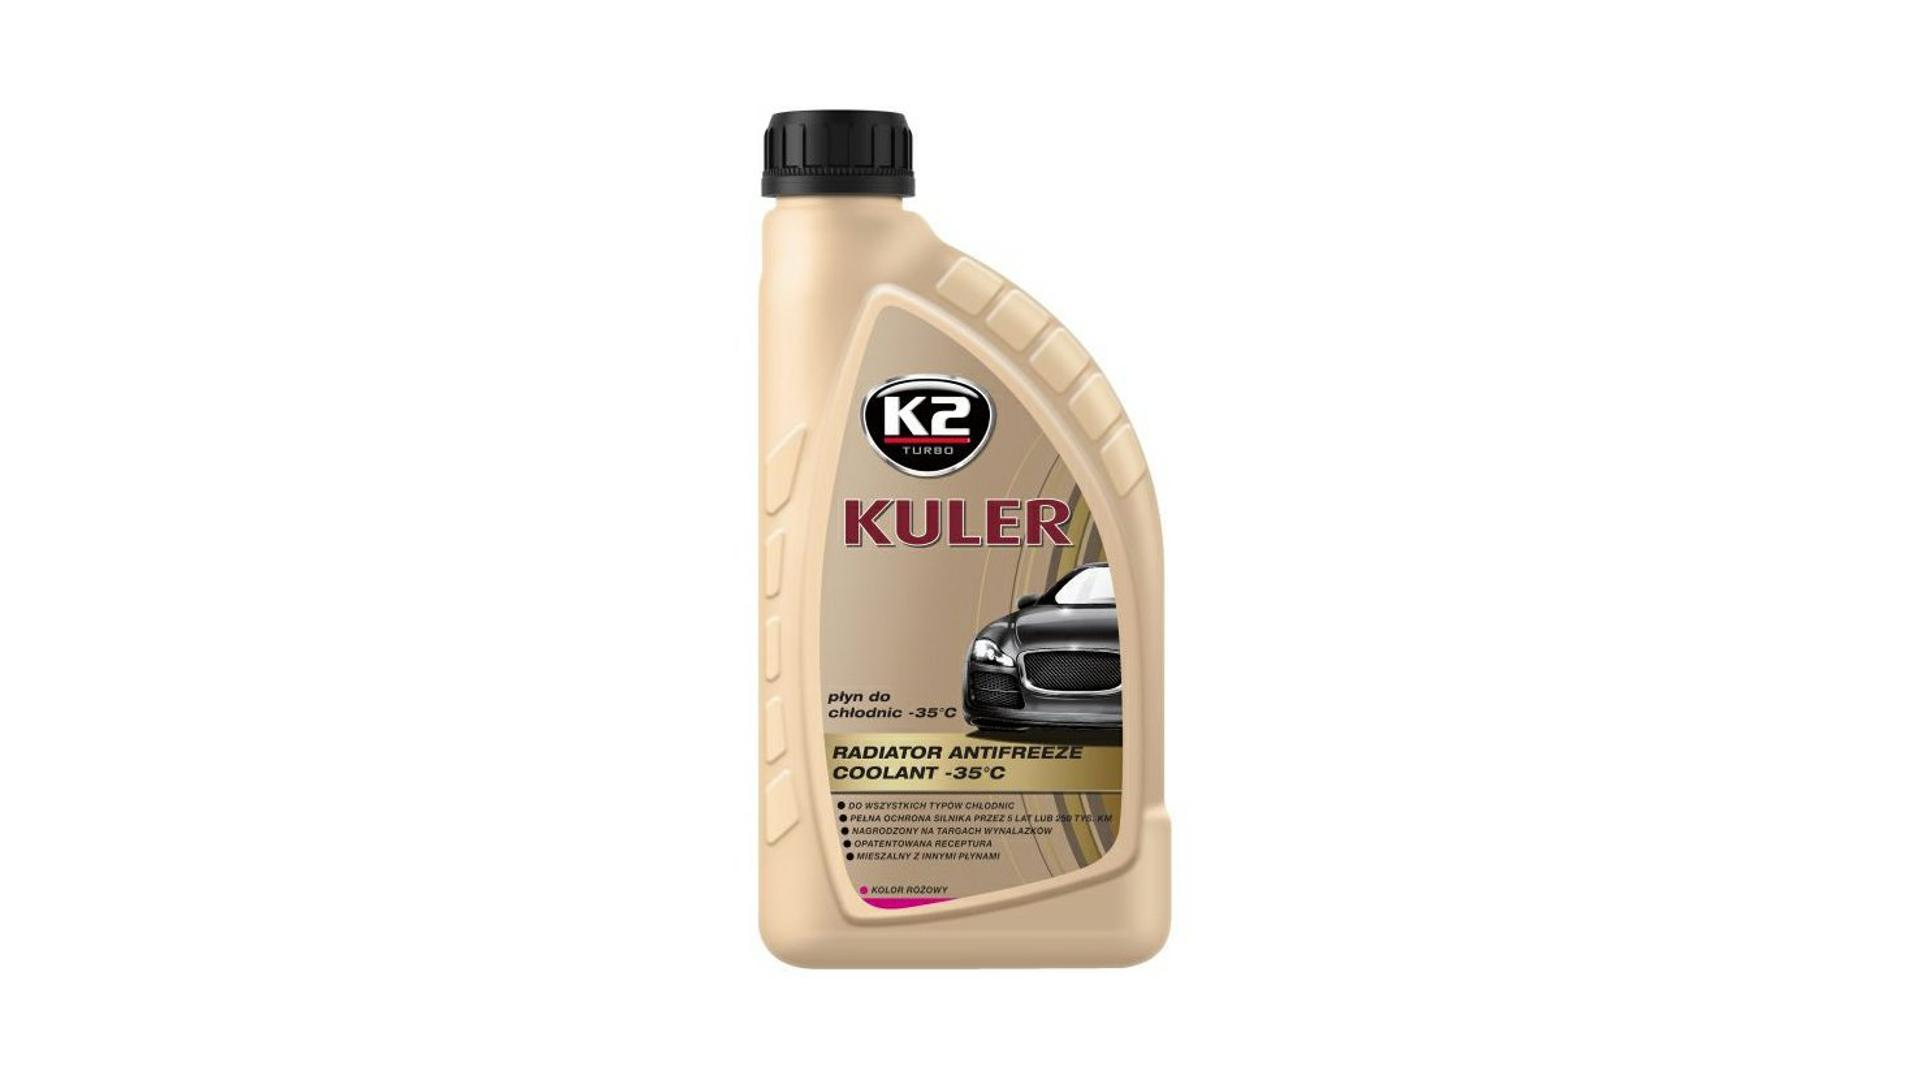 K2 Kuler RUŽOVÁ 1 l - nemrznúca kvapalina do chladiča do -35 ° C